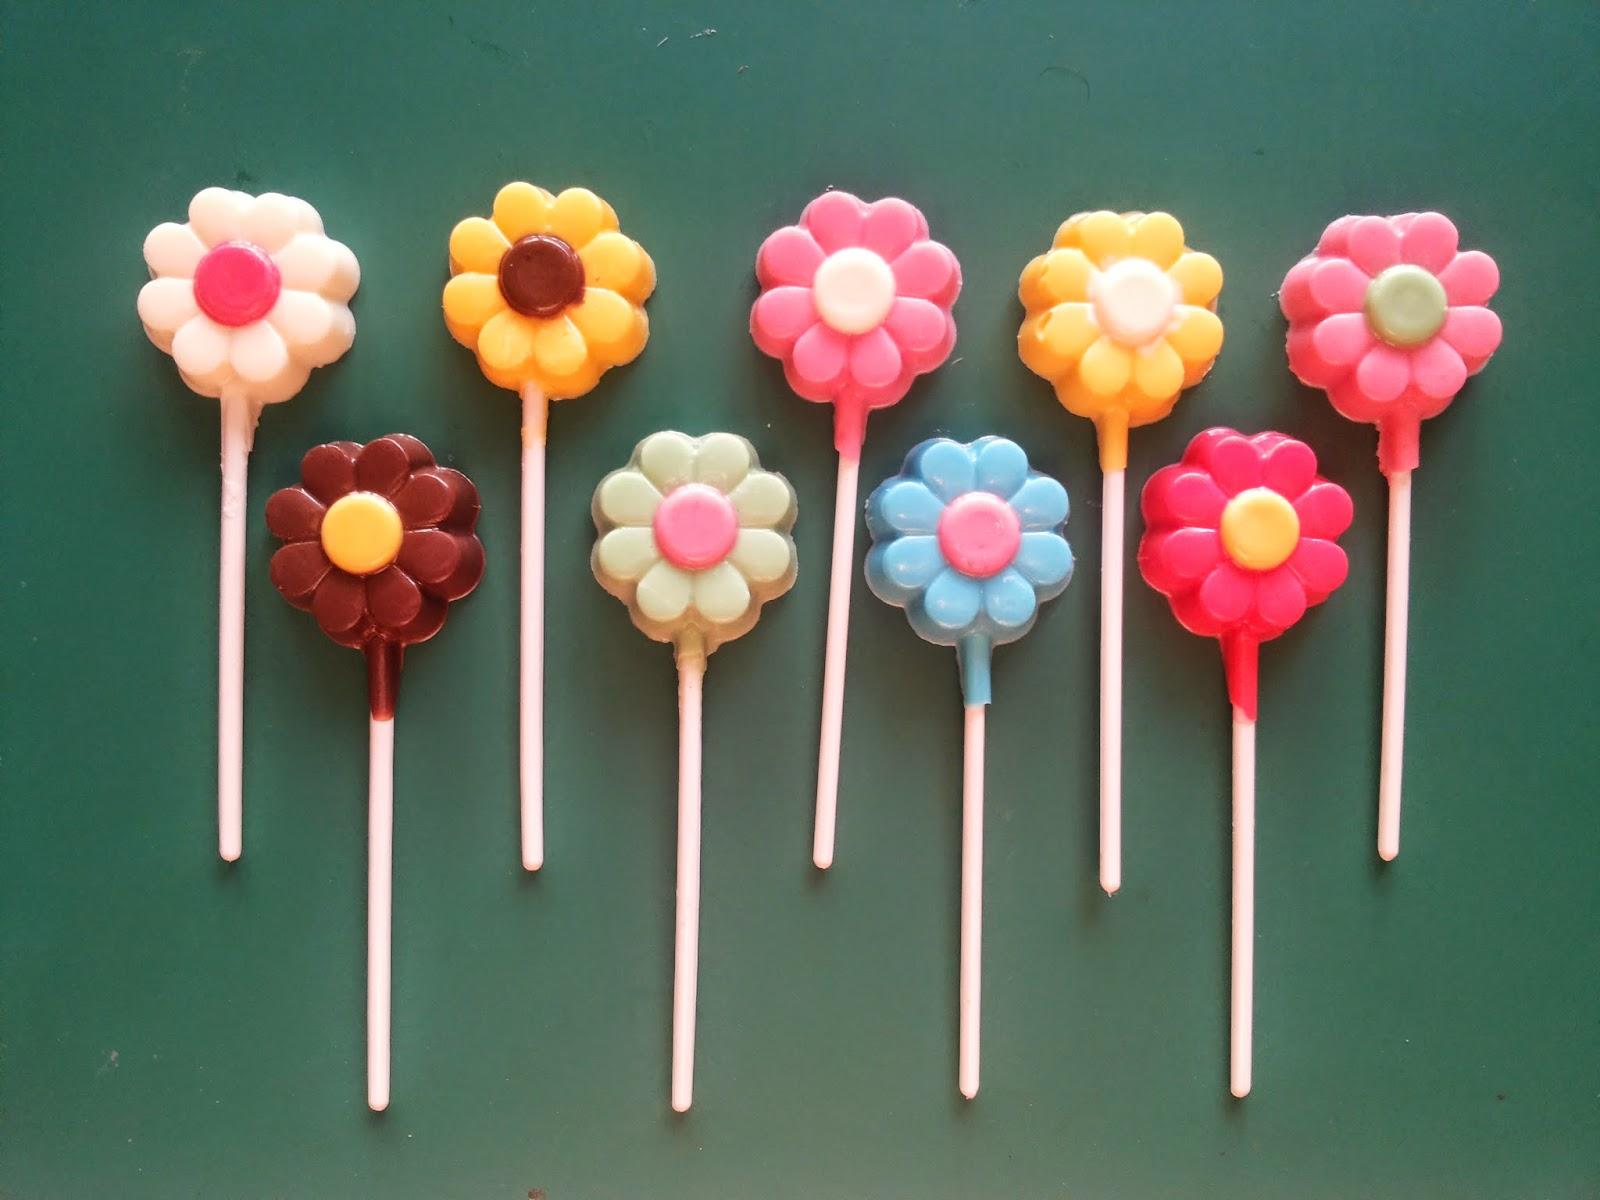 Coklat Candy Stick Lolipop